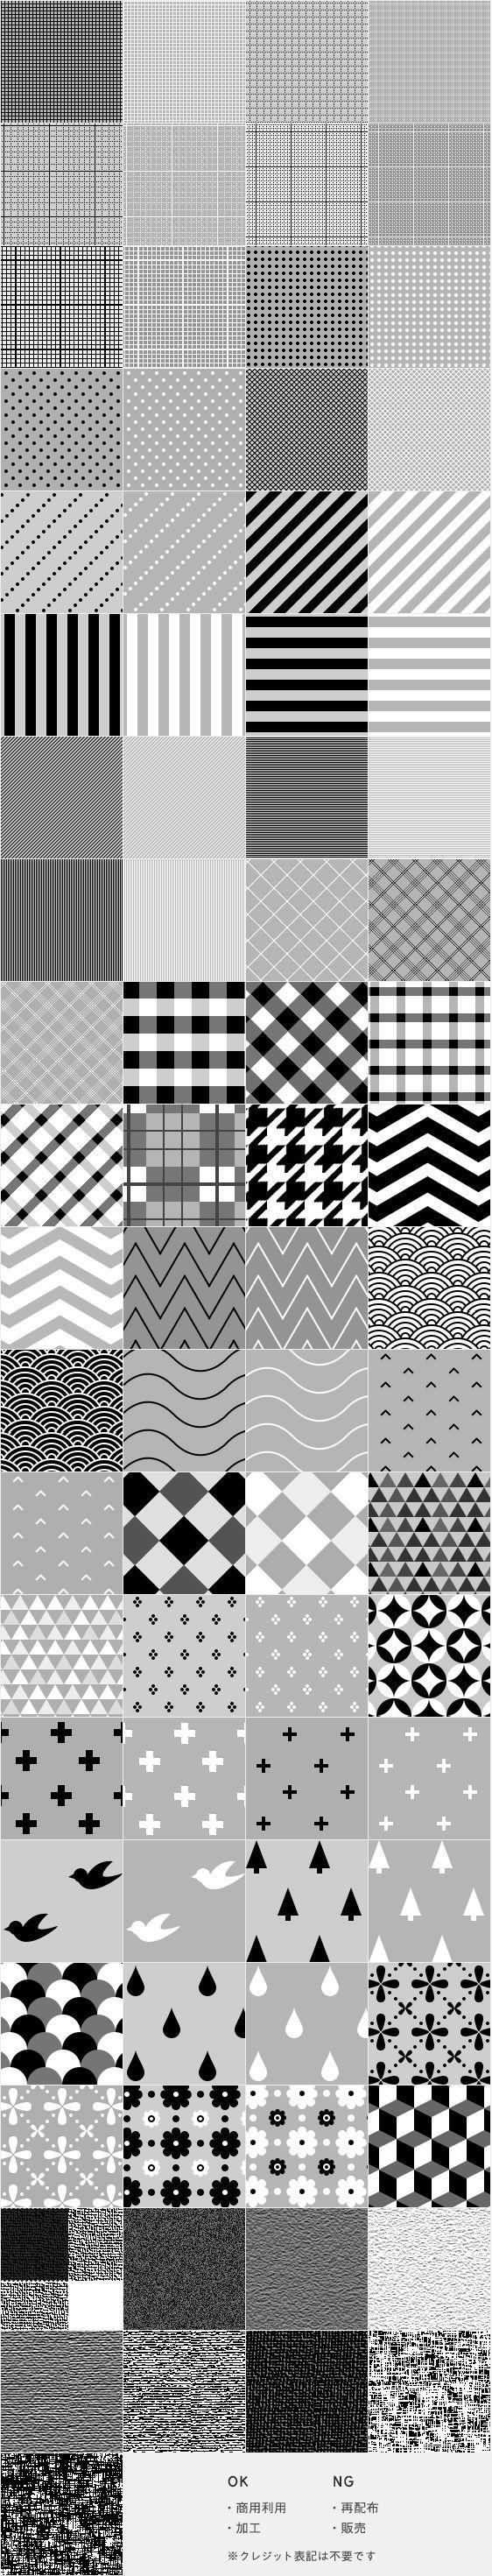 [Photoshop] シンプルで、きっと使い勝手の良いパターン素材 | Arch